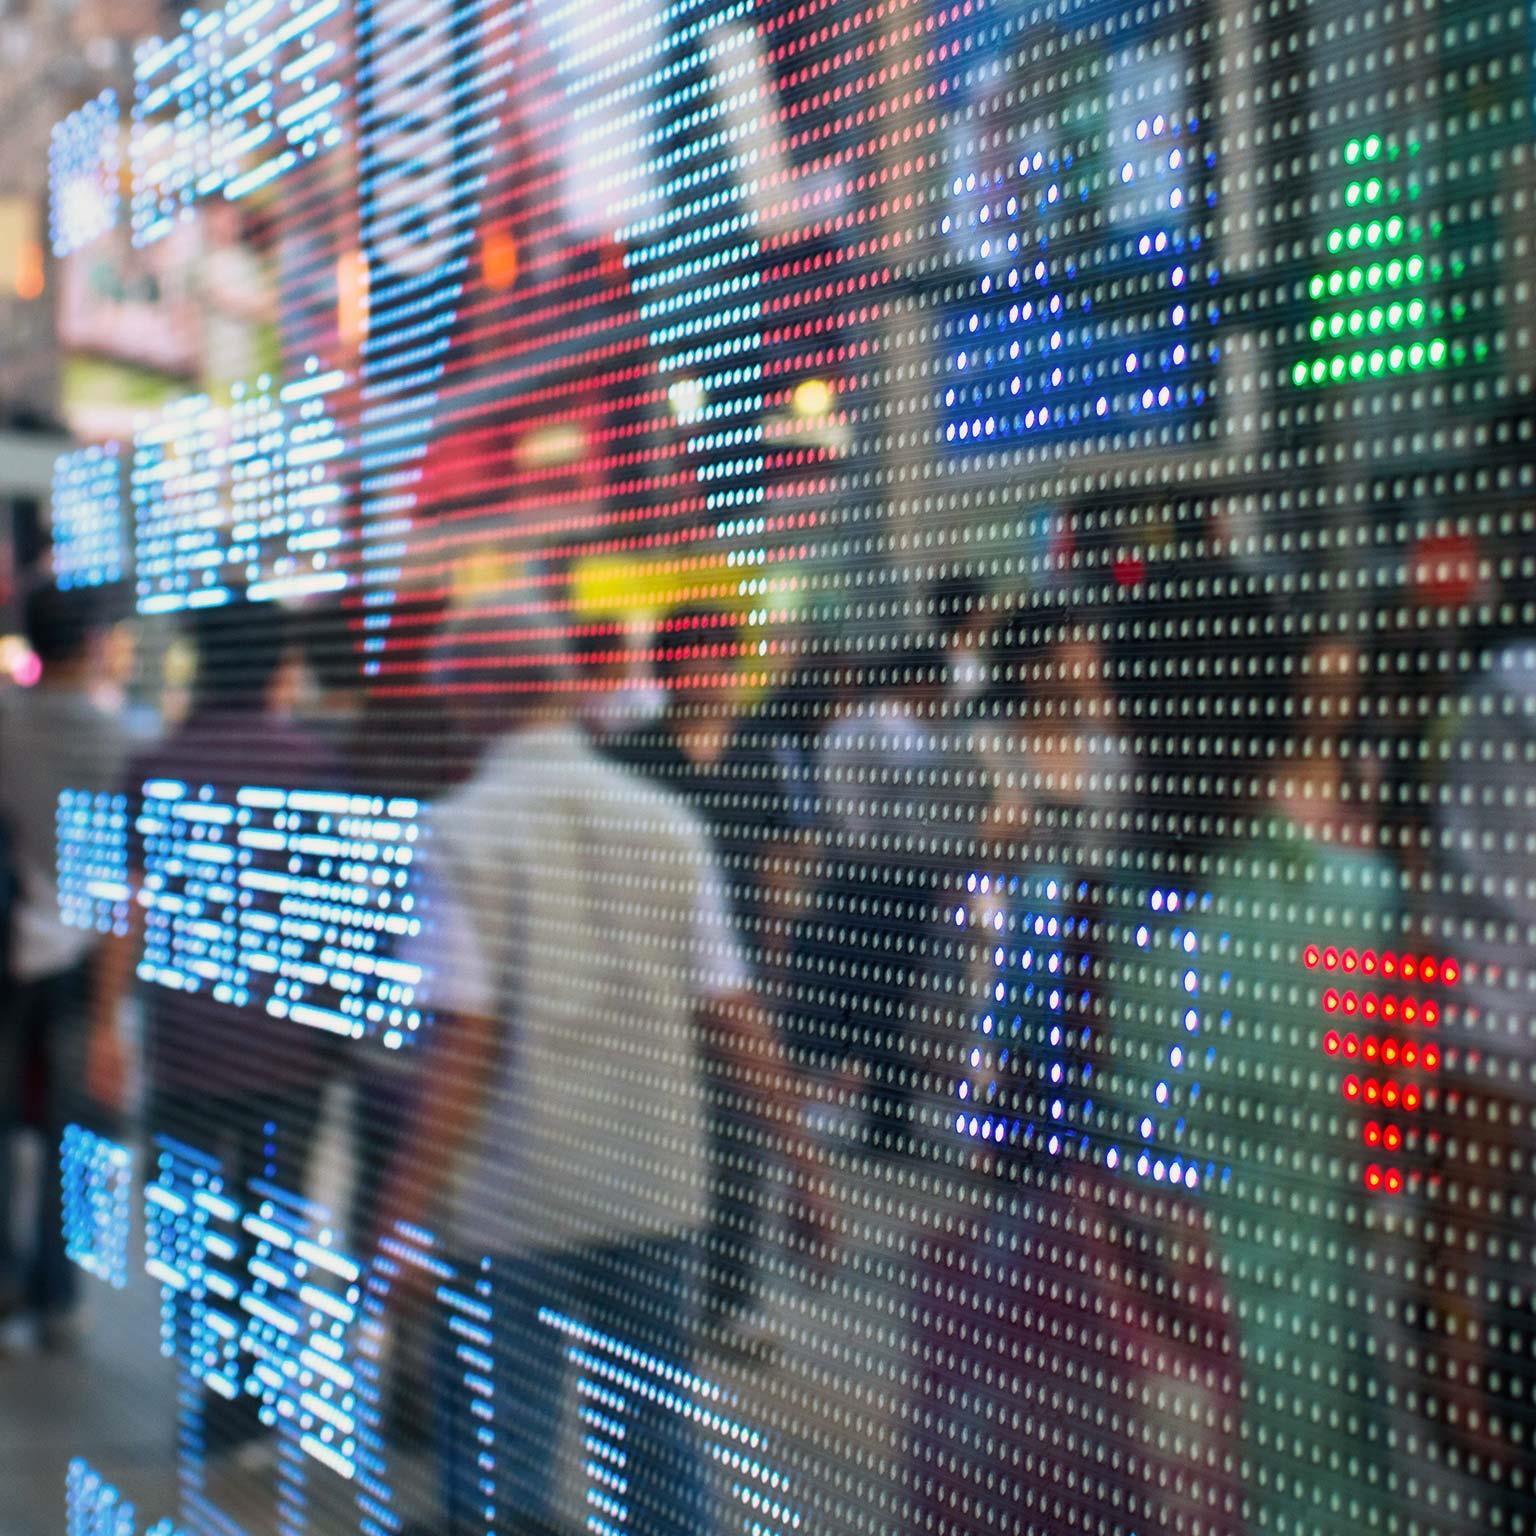 Using analytics to turbocharge China's e-commerce performance